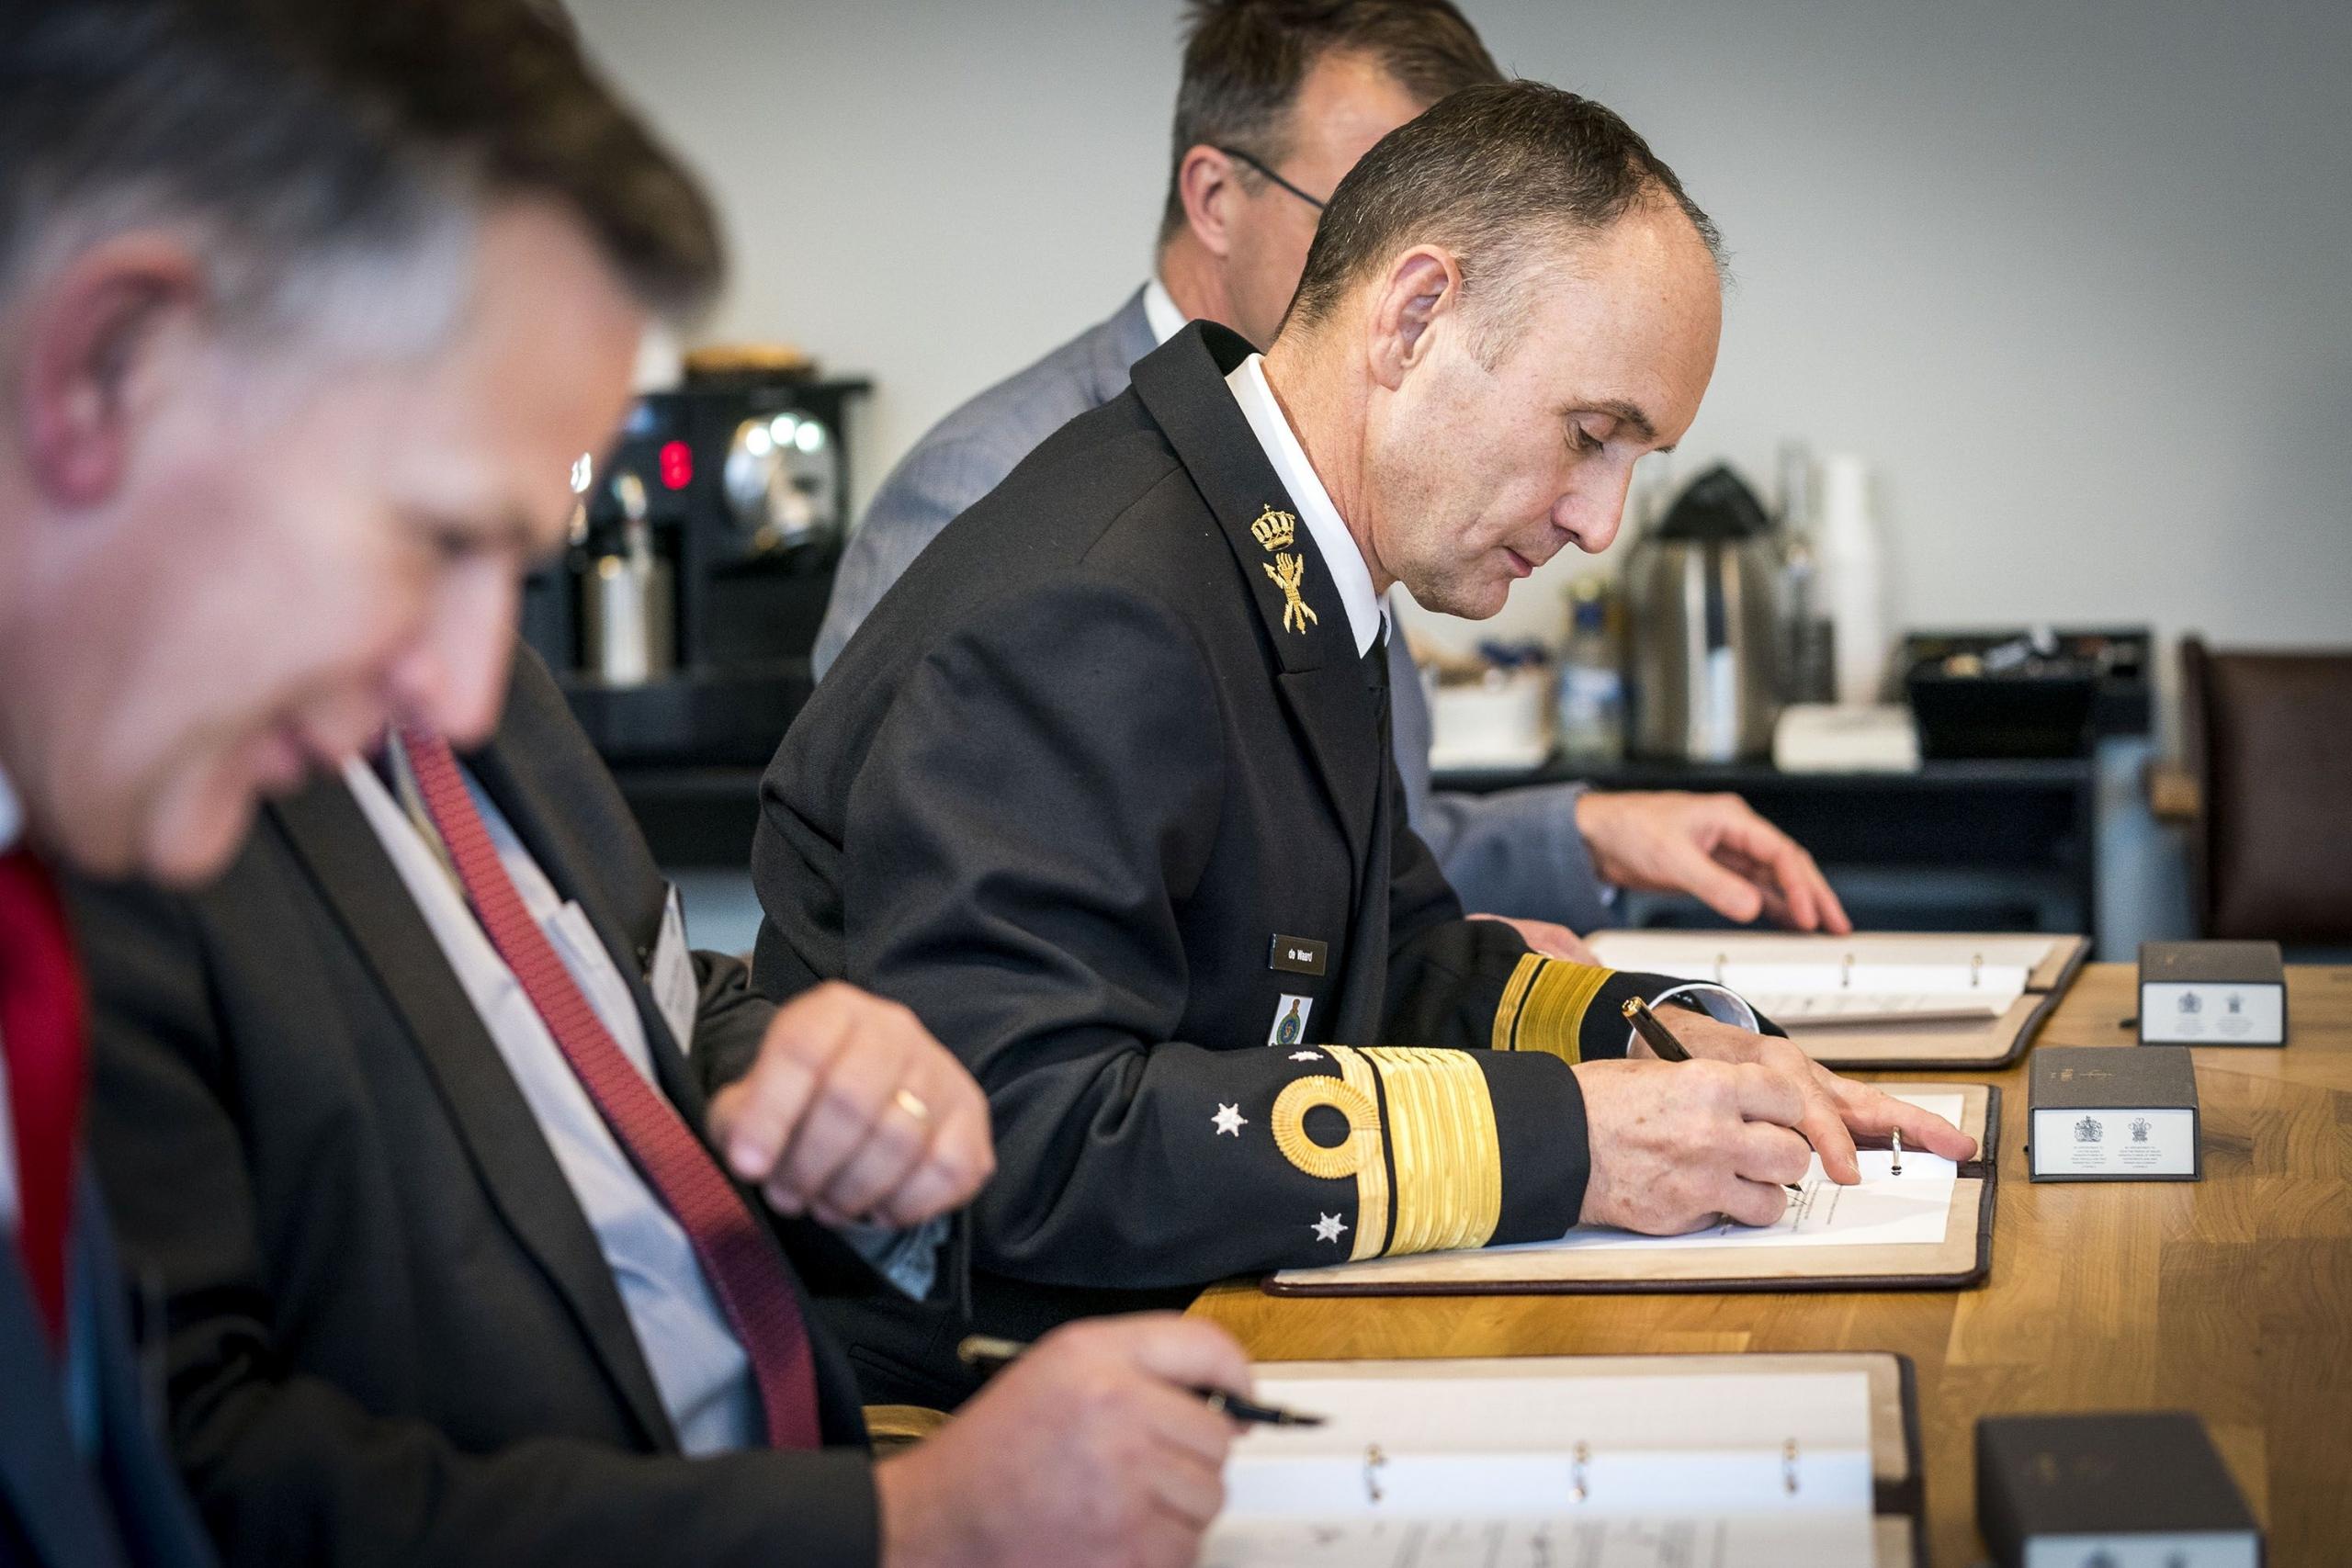 Ondertekening samenwerking DMO, NLR, TNO en MARIN